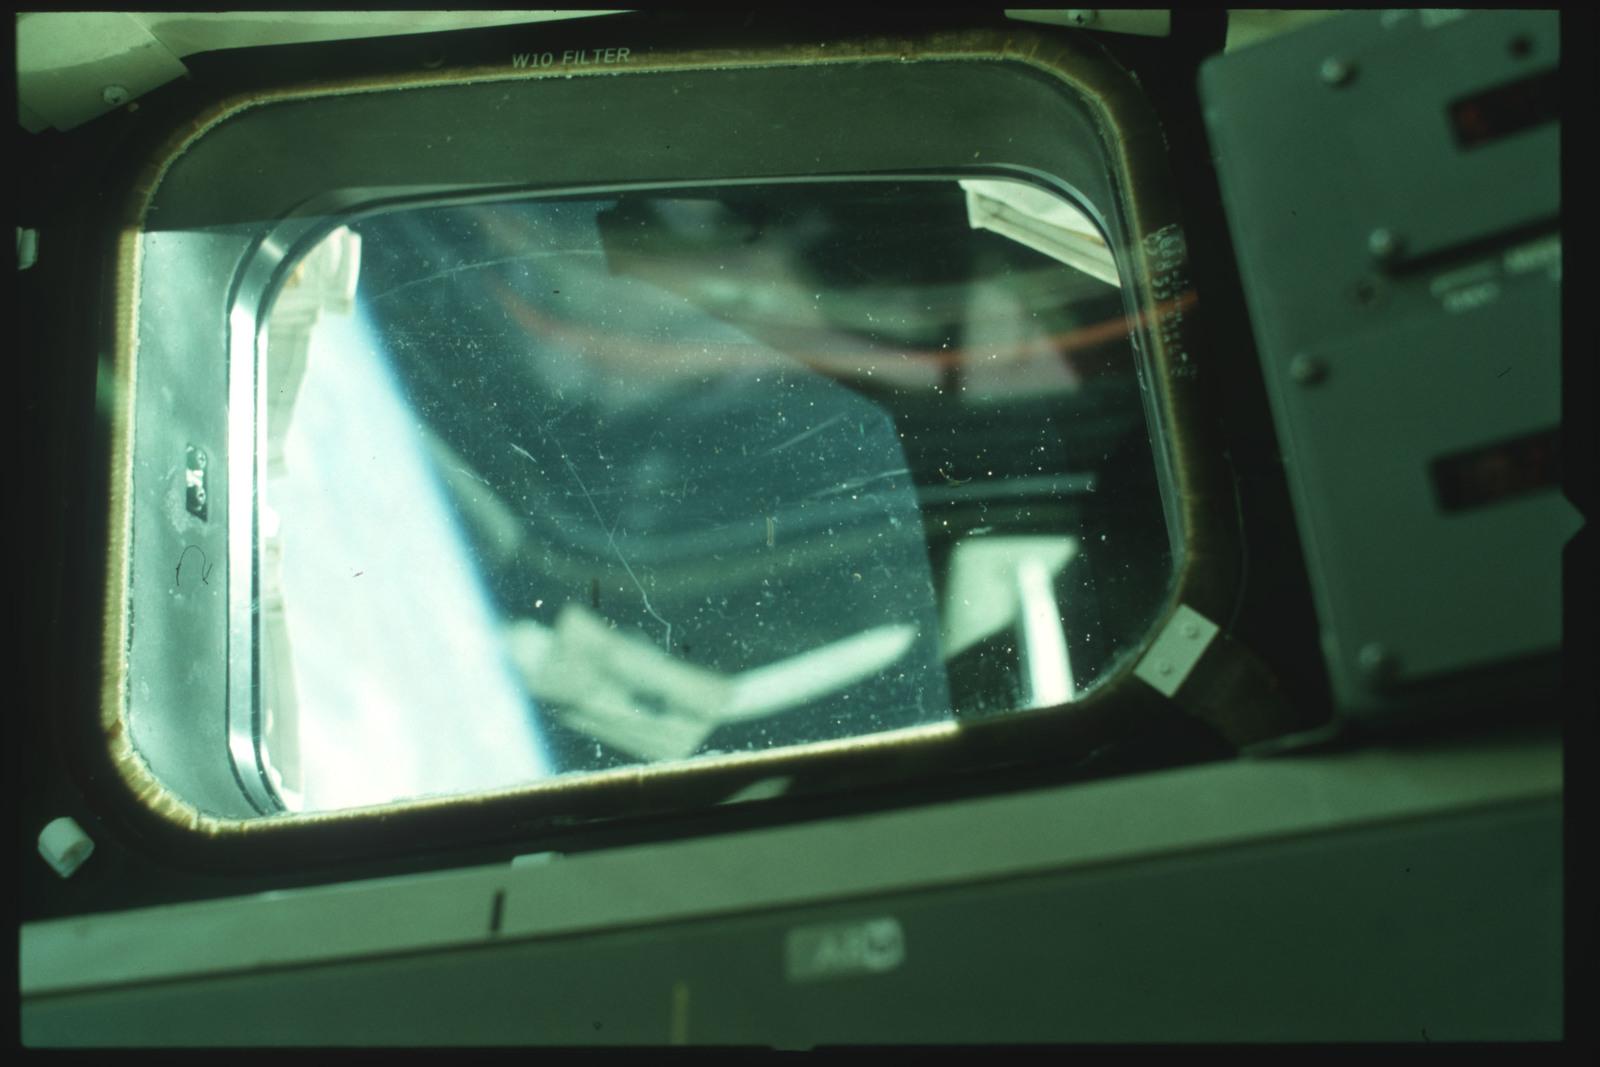 S01-07-508 - STS-001 - Crew compartment flight deck window debris,damage,streak documentation